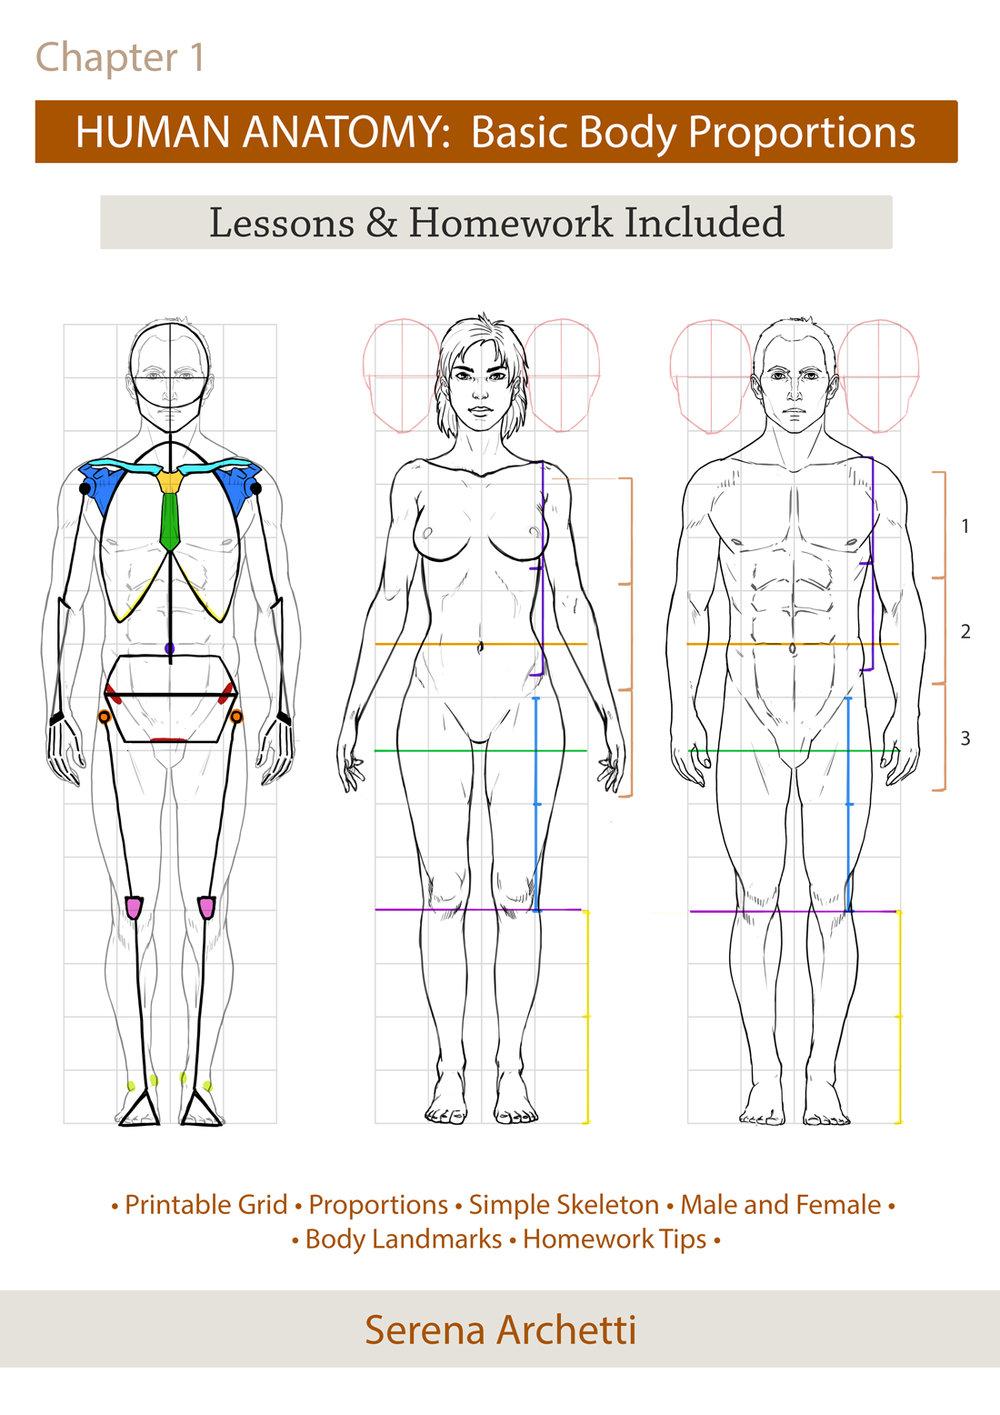 Human Anatomy Body Proportions Tutorial Homework Serena Archetti